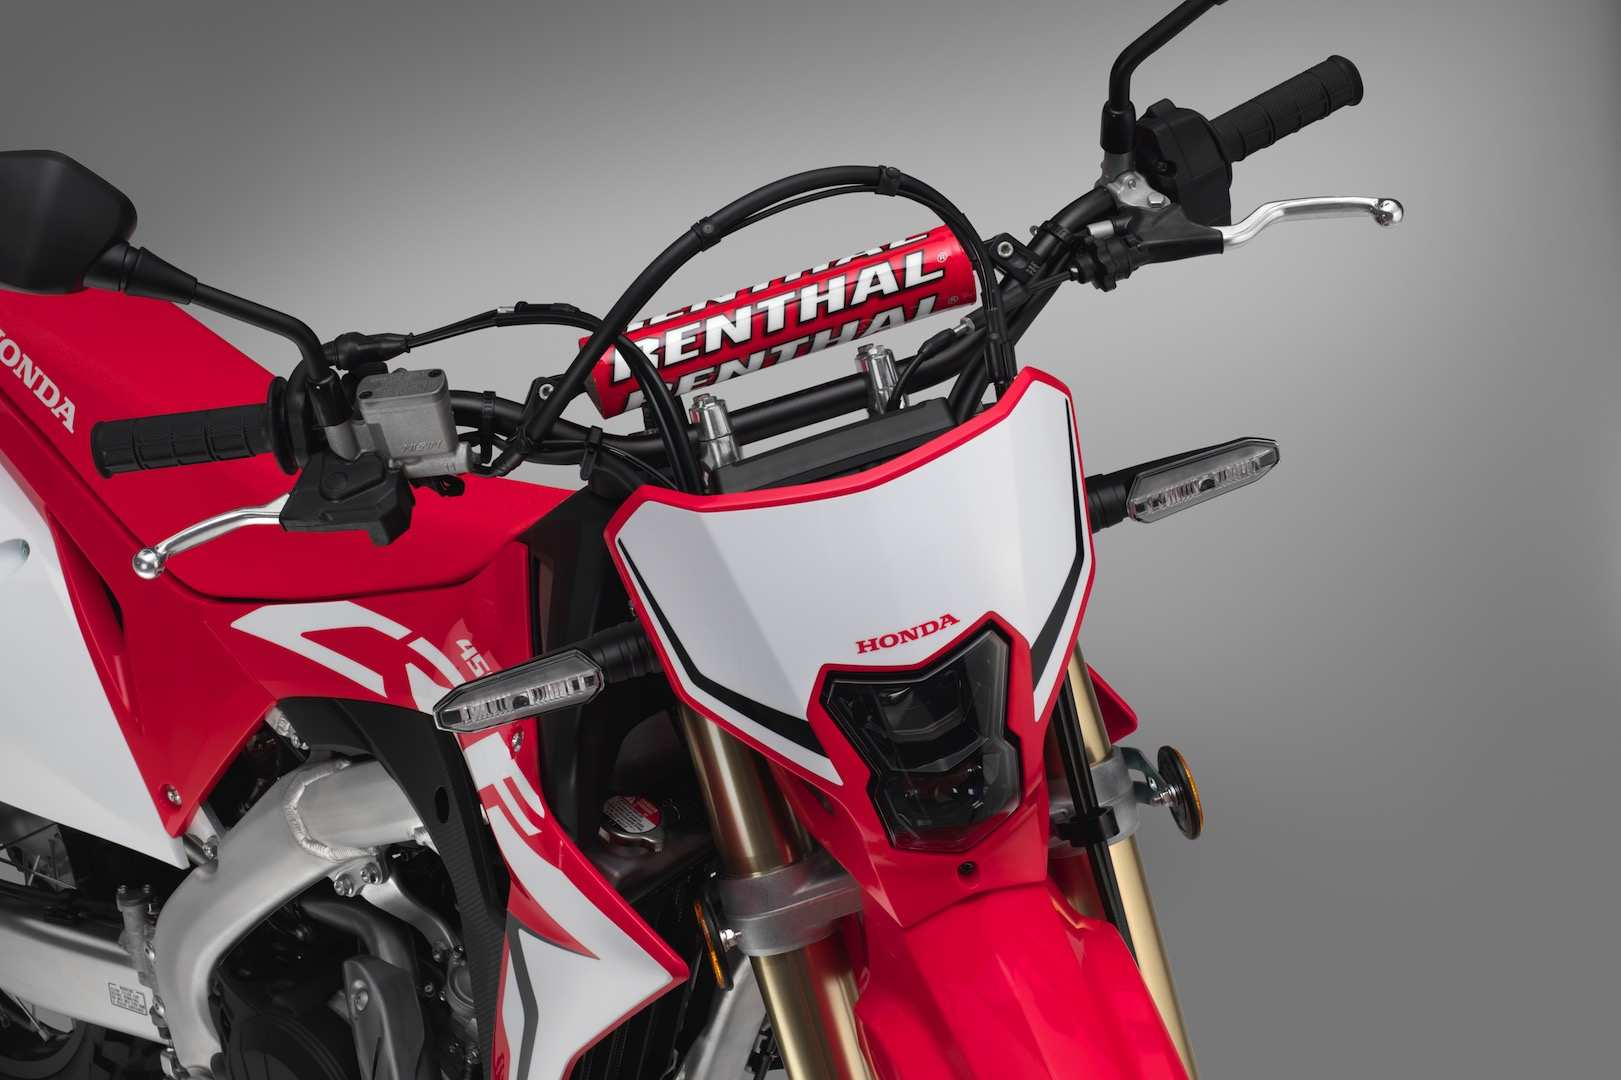 50 New 2019 Honda 450 Dual Sport Photos with 2019 Honda 450 Dual Sport